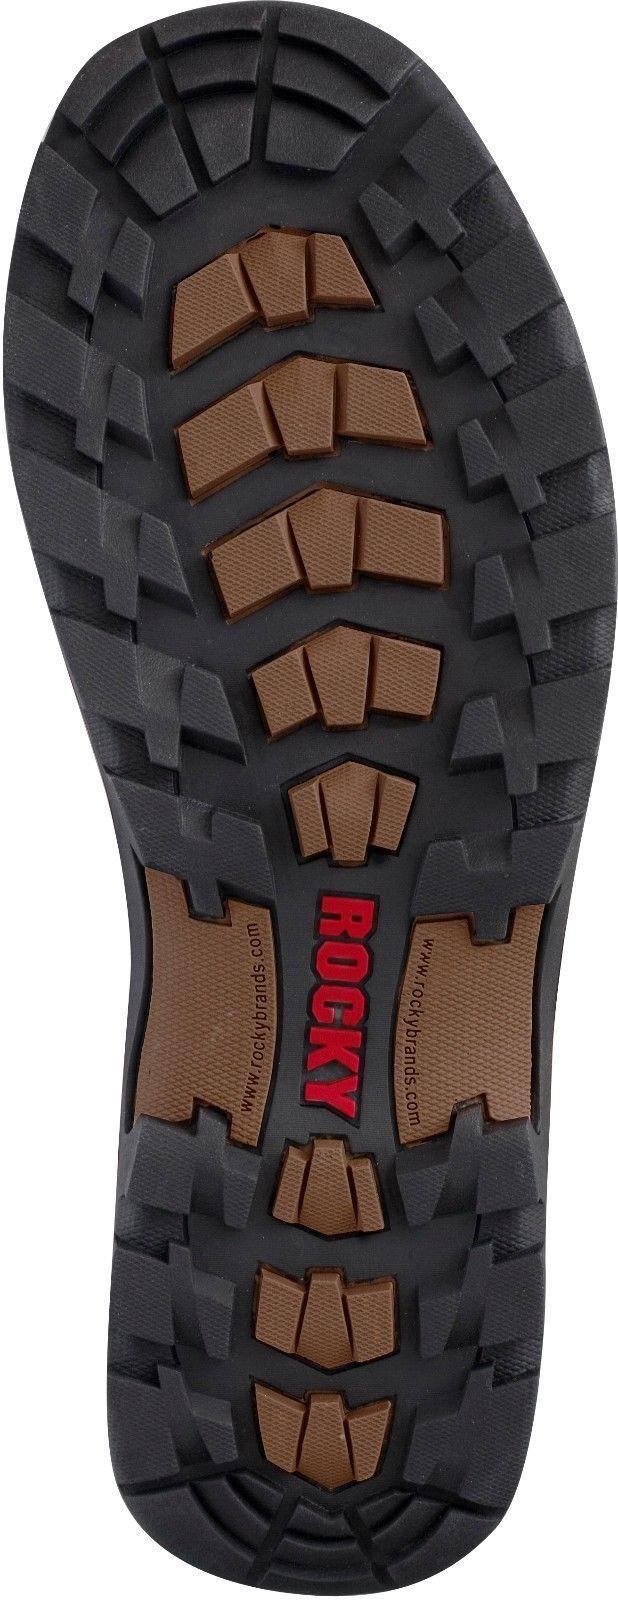 ROCKY PROLIGHT WATERPROOF SNAKE PROOF PROOF PROOF HUNTING Stiefel FQ0001570  ALL GrößeS - NEW dd1065